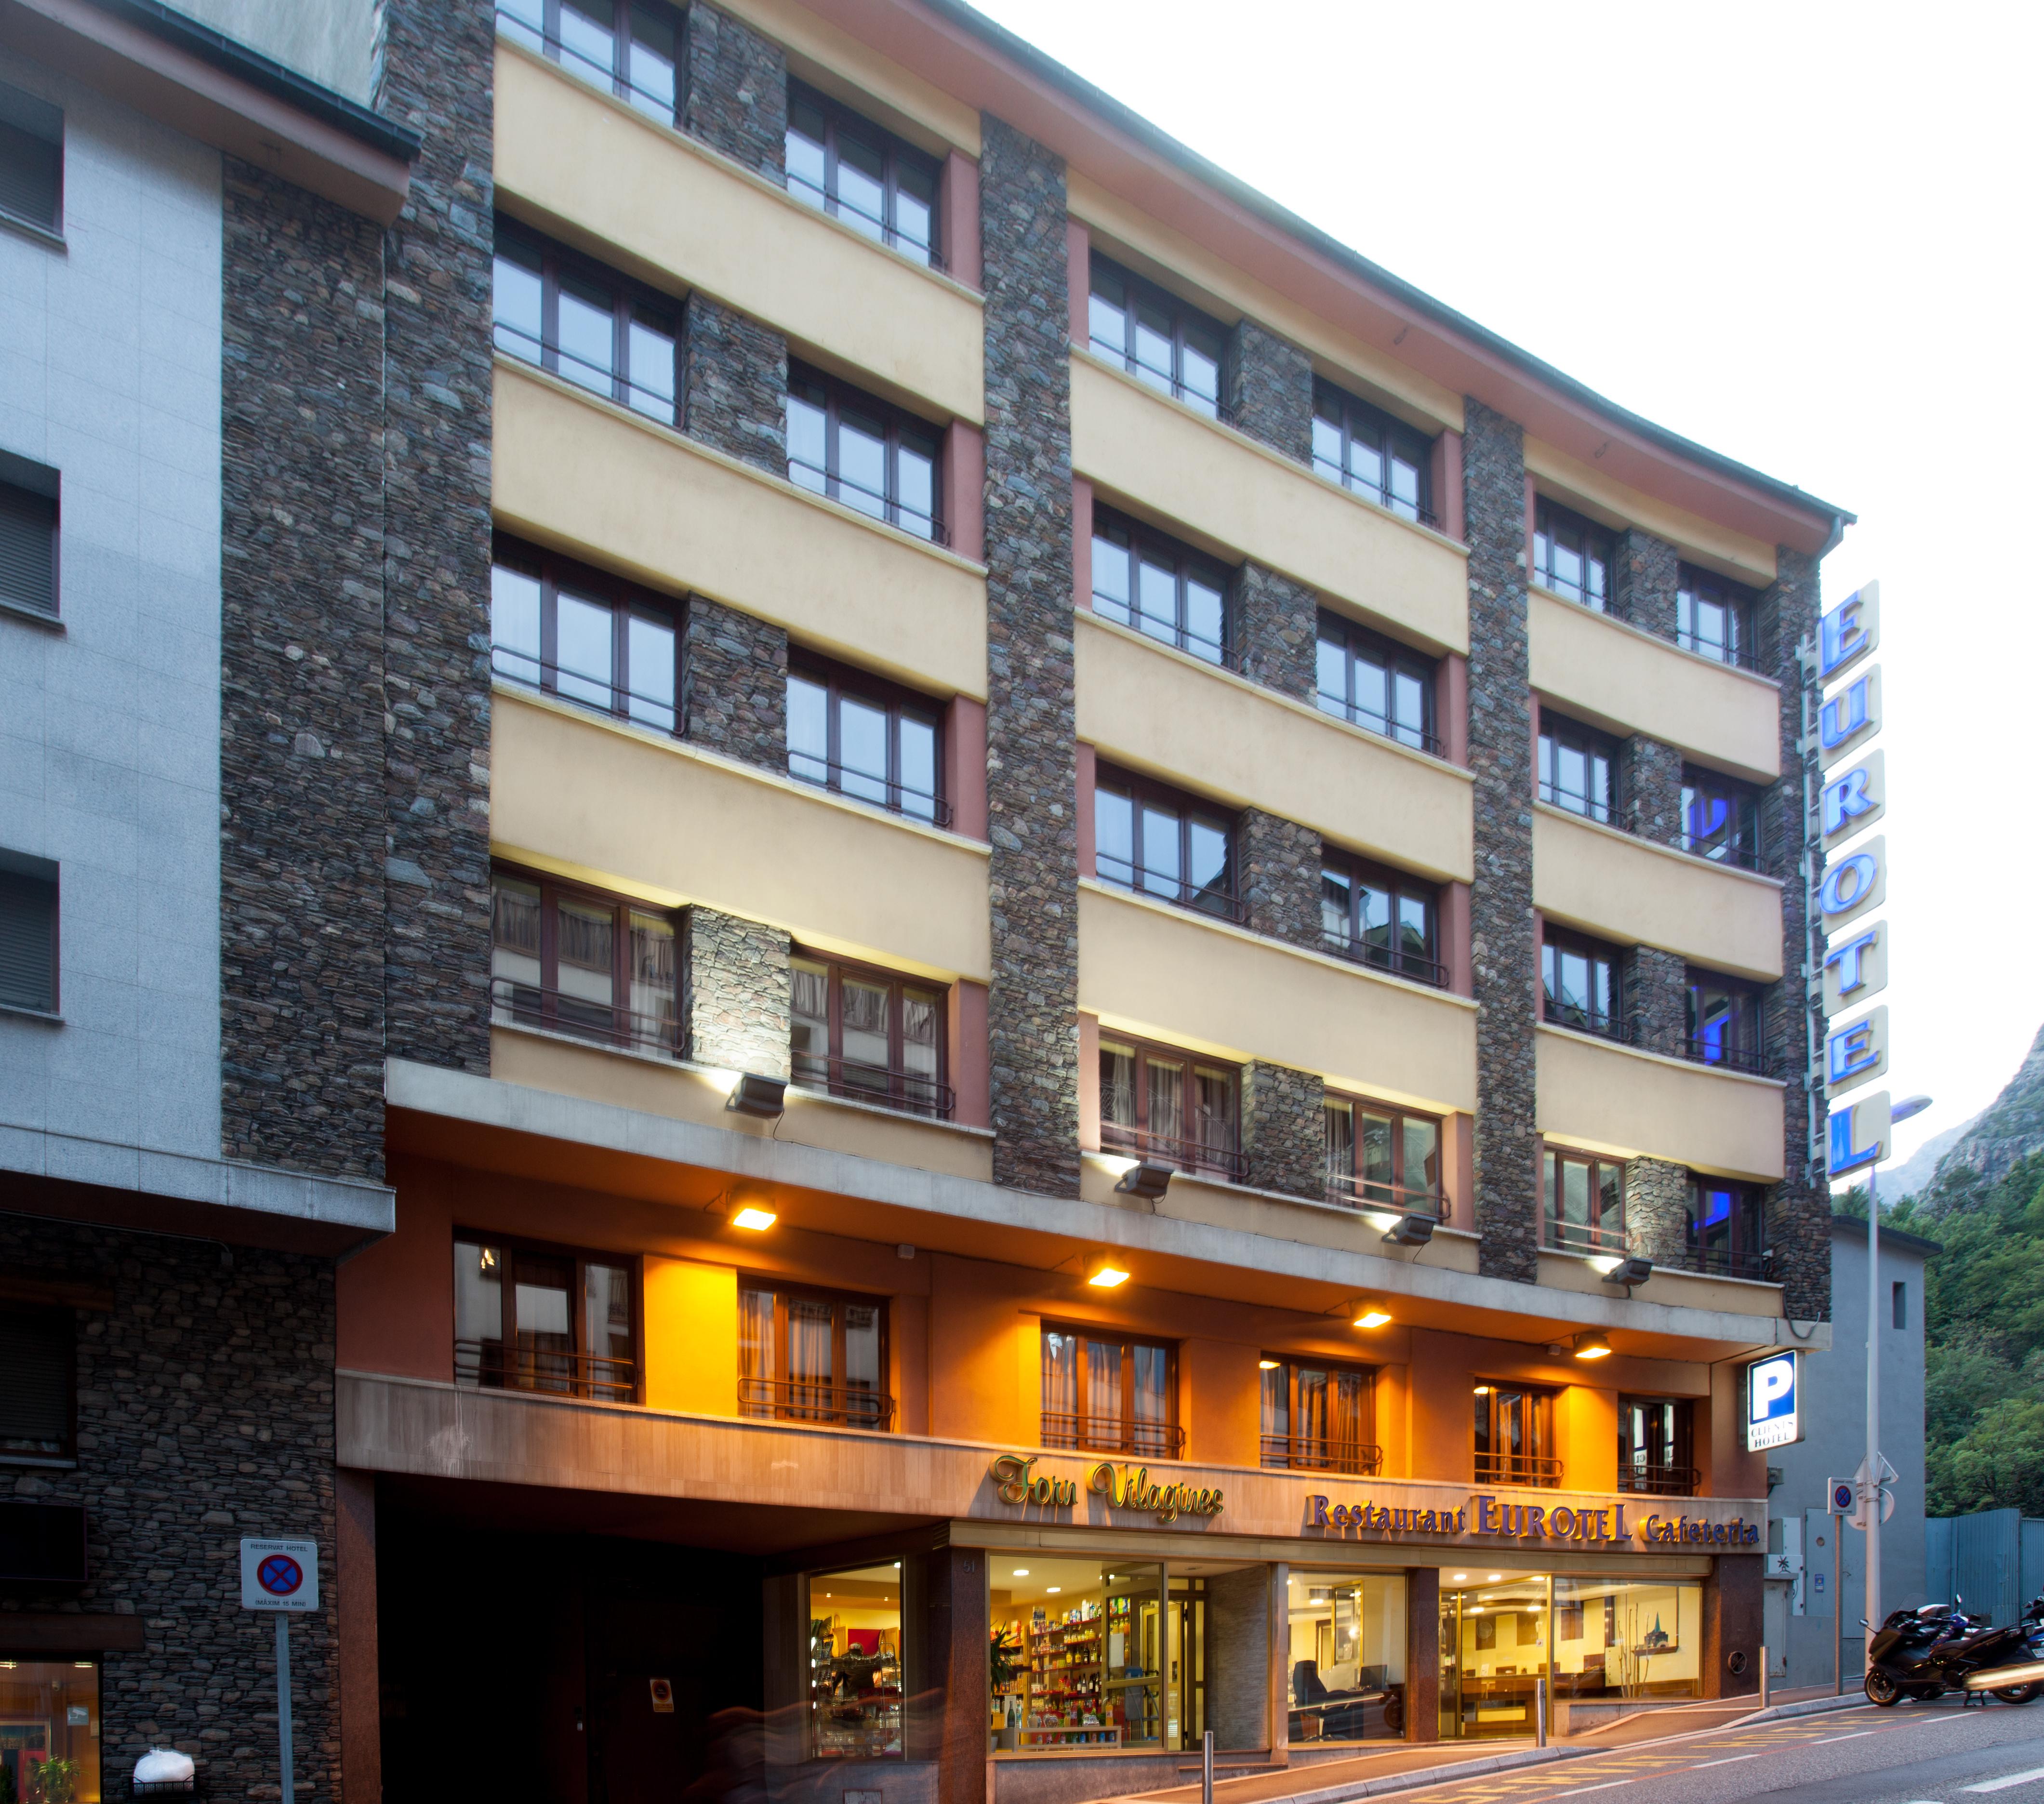 Hotel Silken Insitu Eurotel